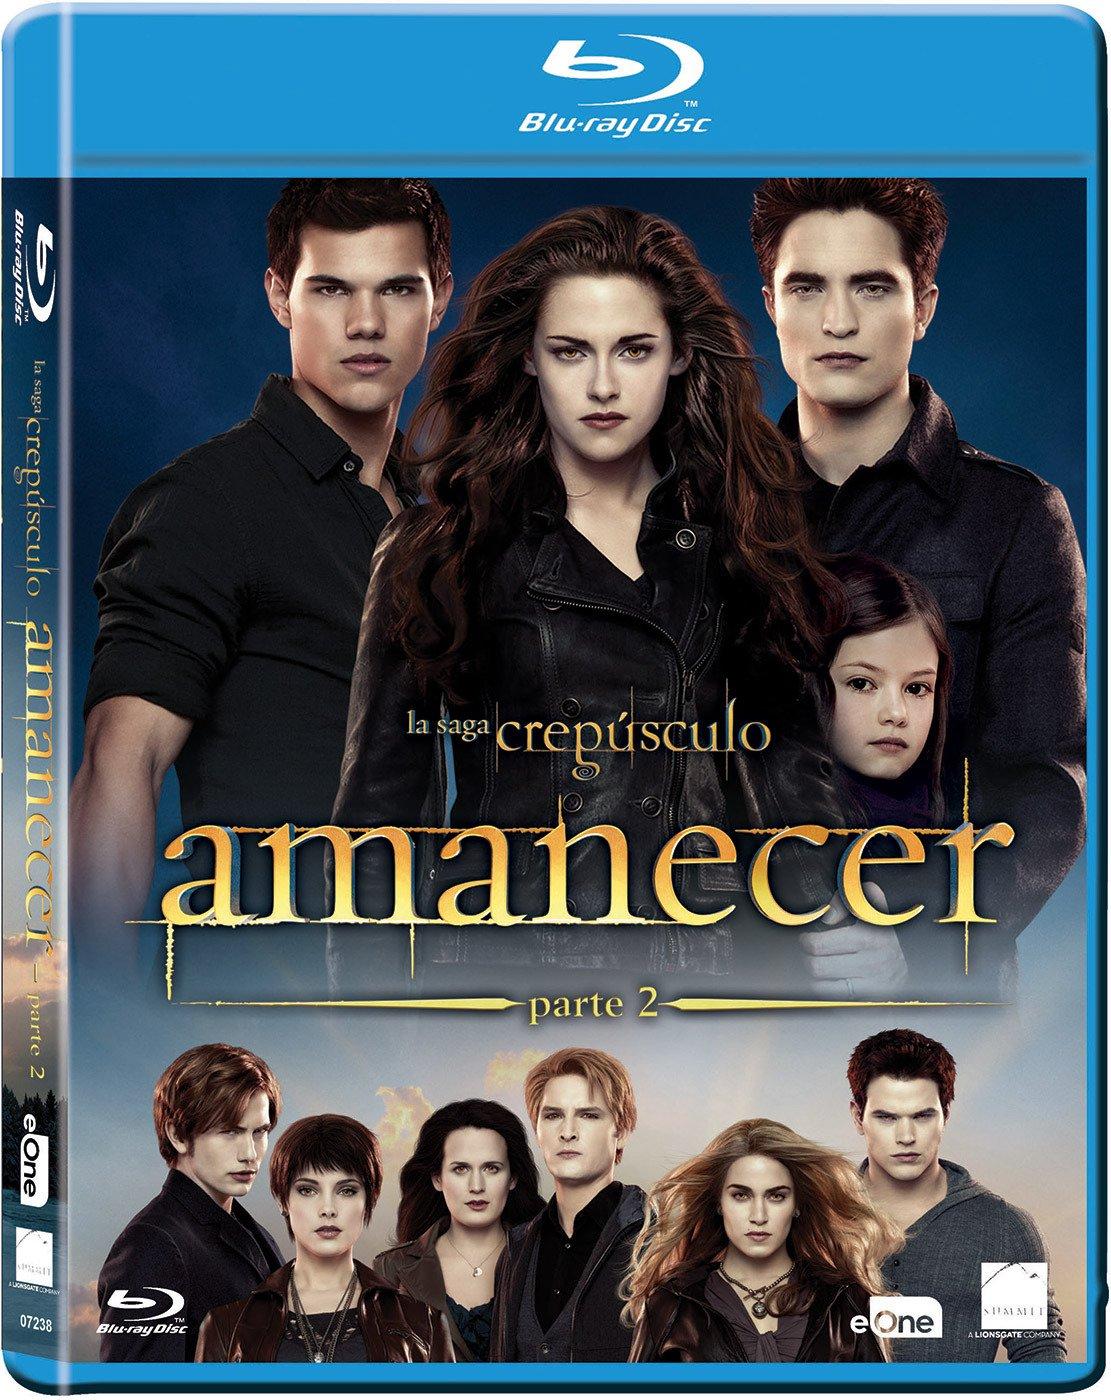 Crepusculo: Amanecer Parte 2 Blu-Ray [Blu-ray]: Amazon.es: Kristen ...